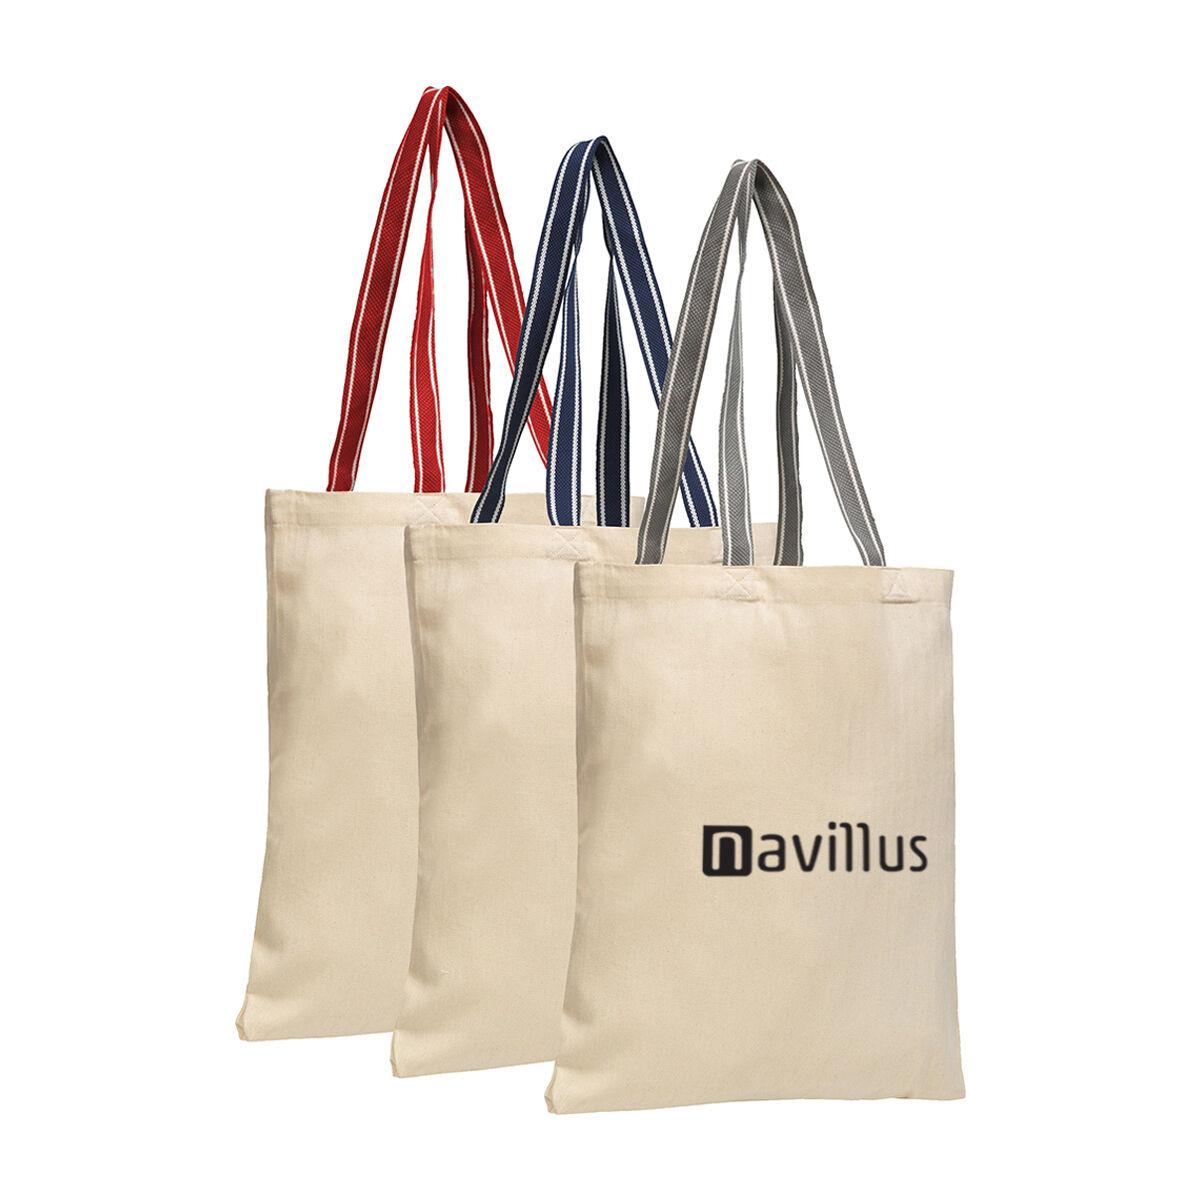 Herringbone Style Cotton Tote Bag